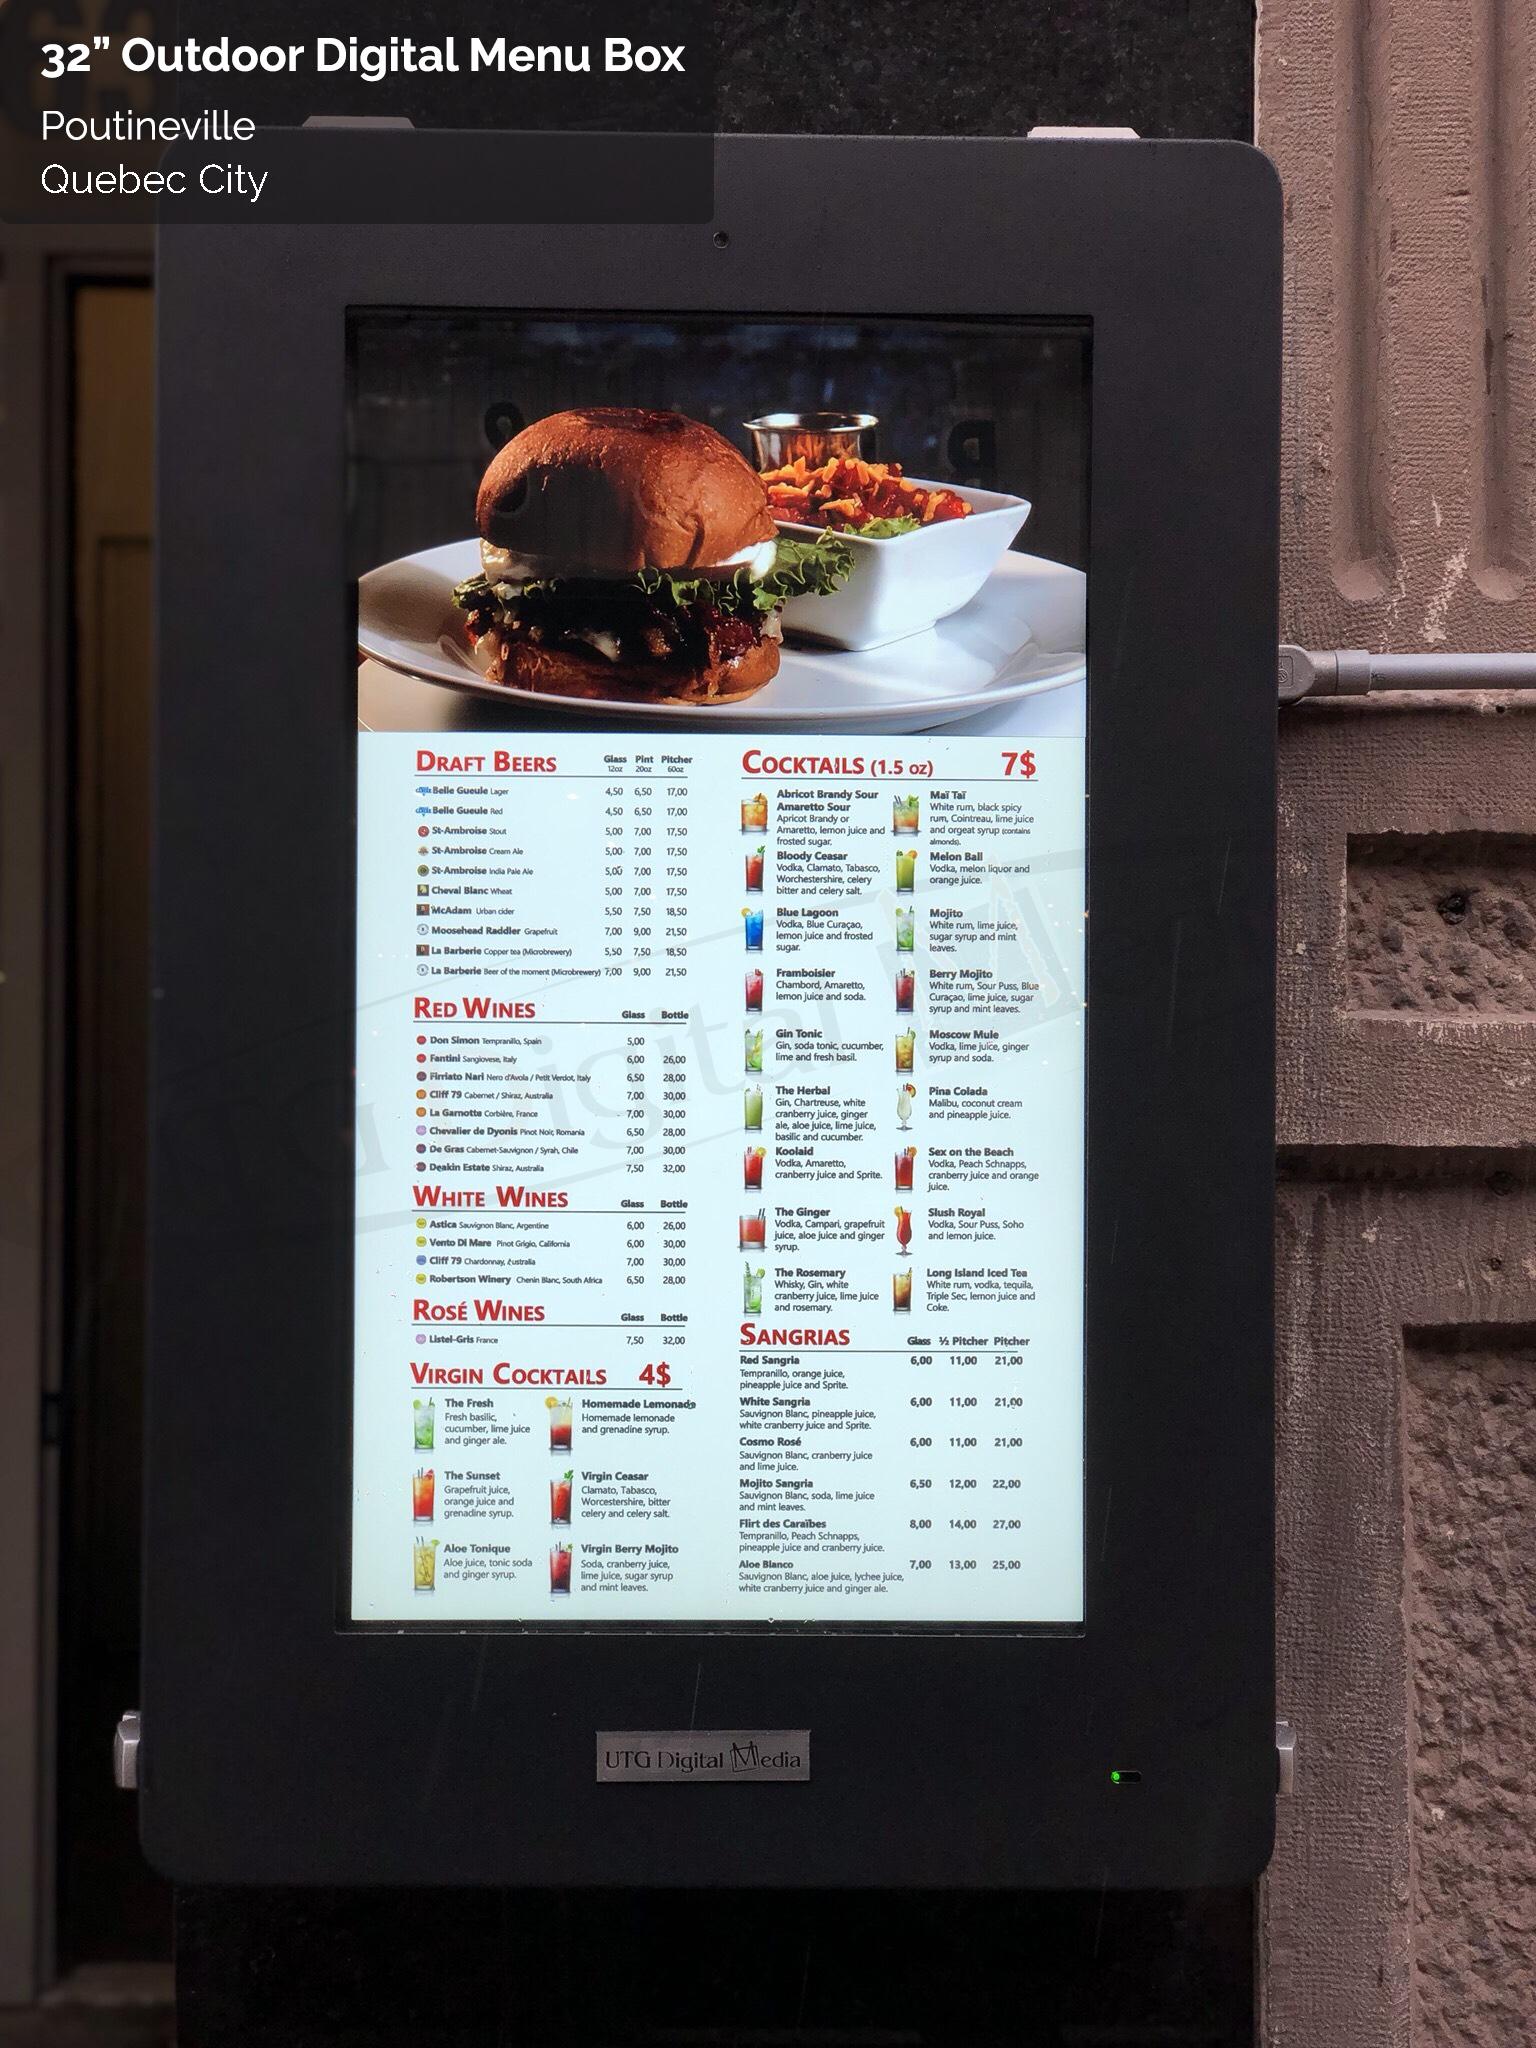 Indoor and Outdoor Digital Signage Displays | UTG Digital Media